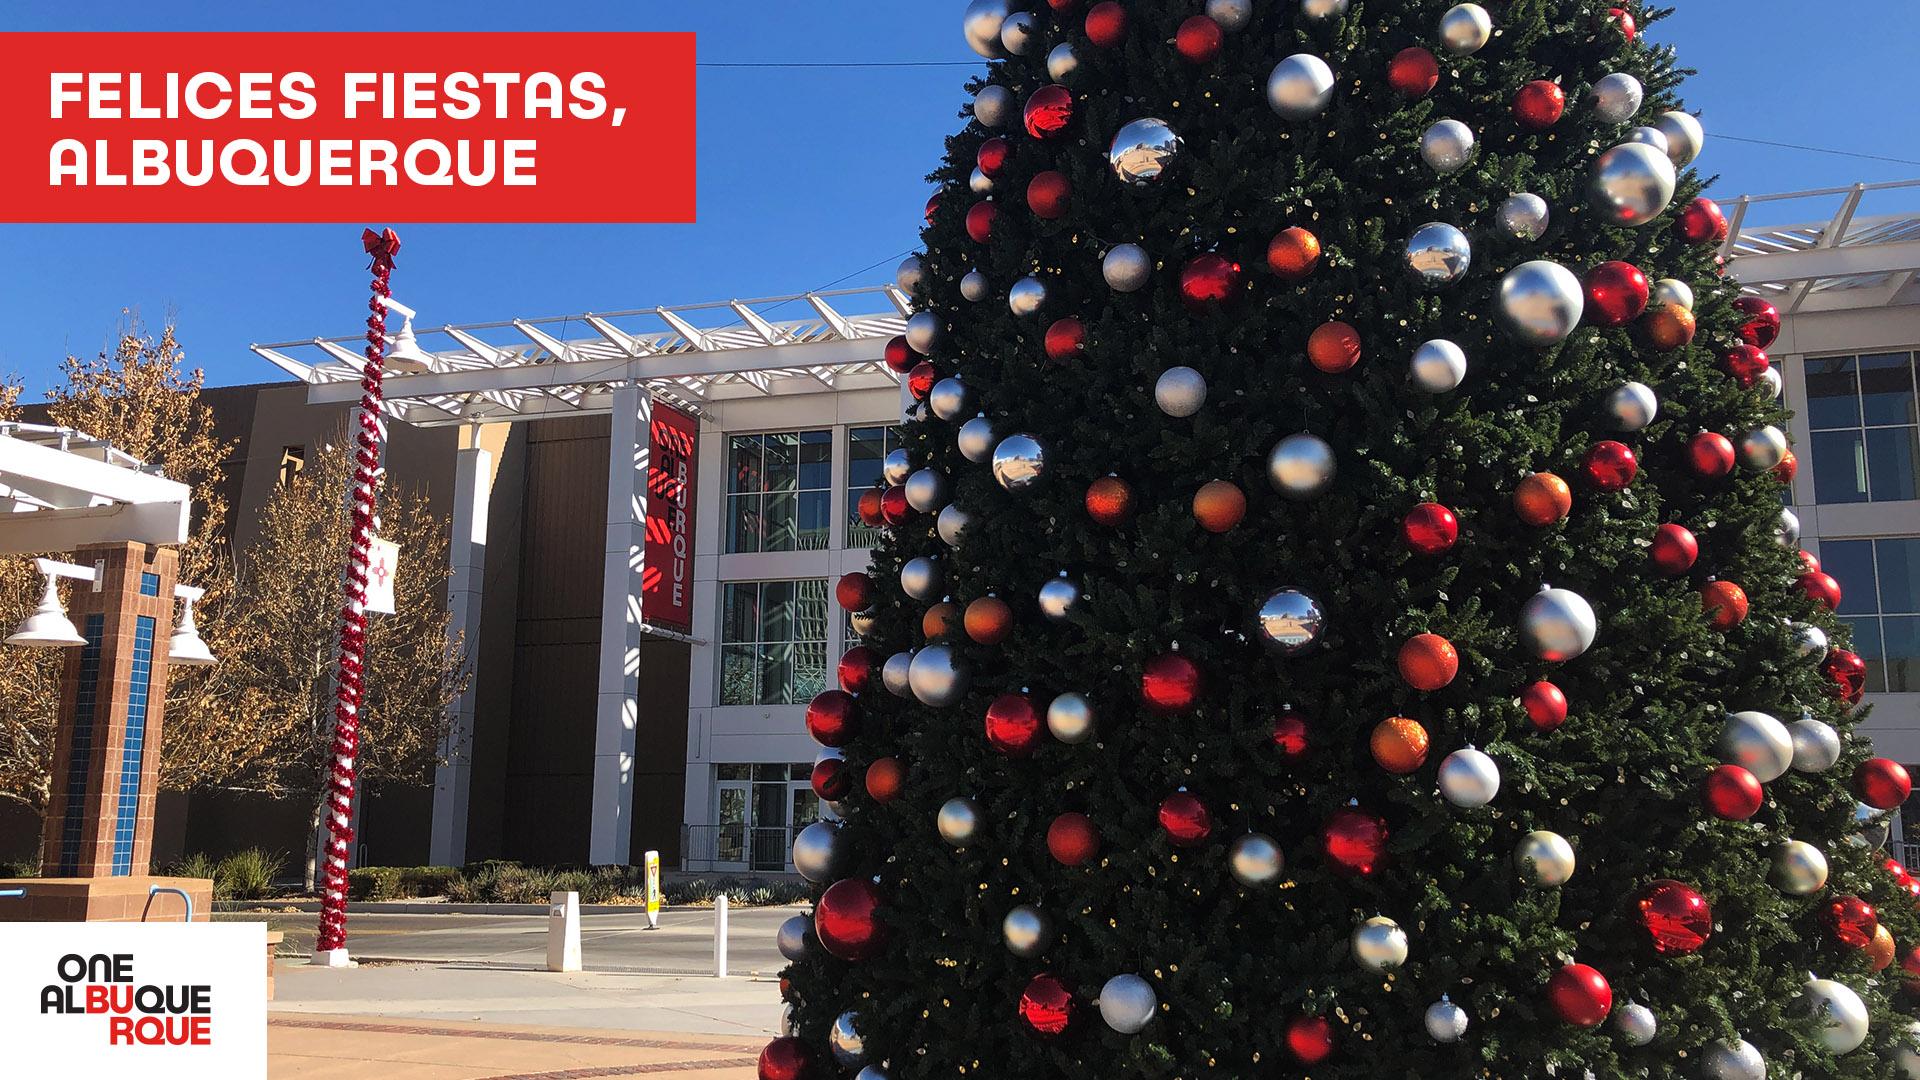 Civic Plaza Holiday Desktop Background - Spanish